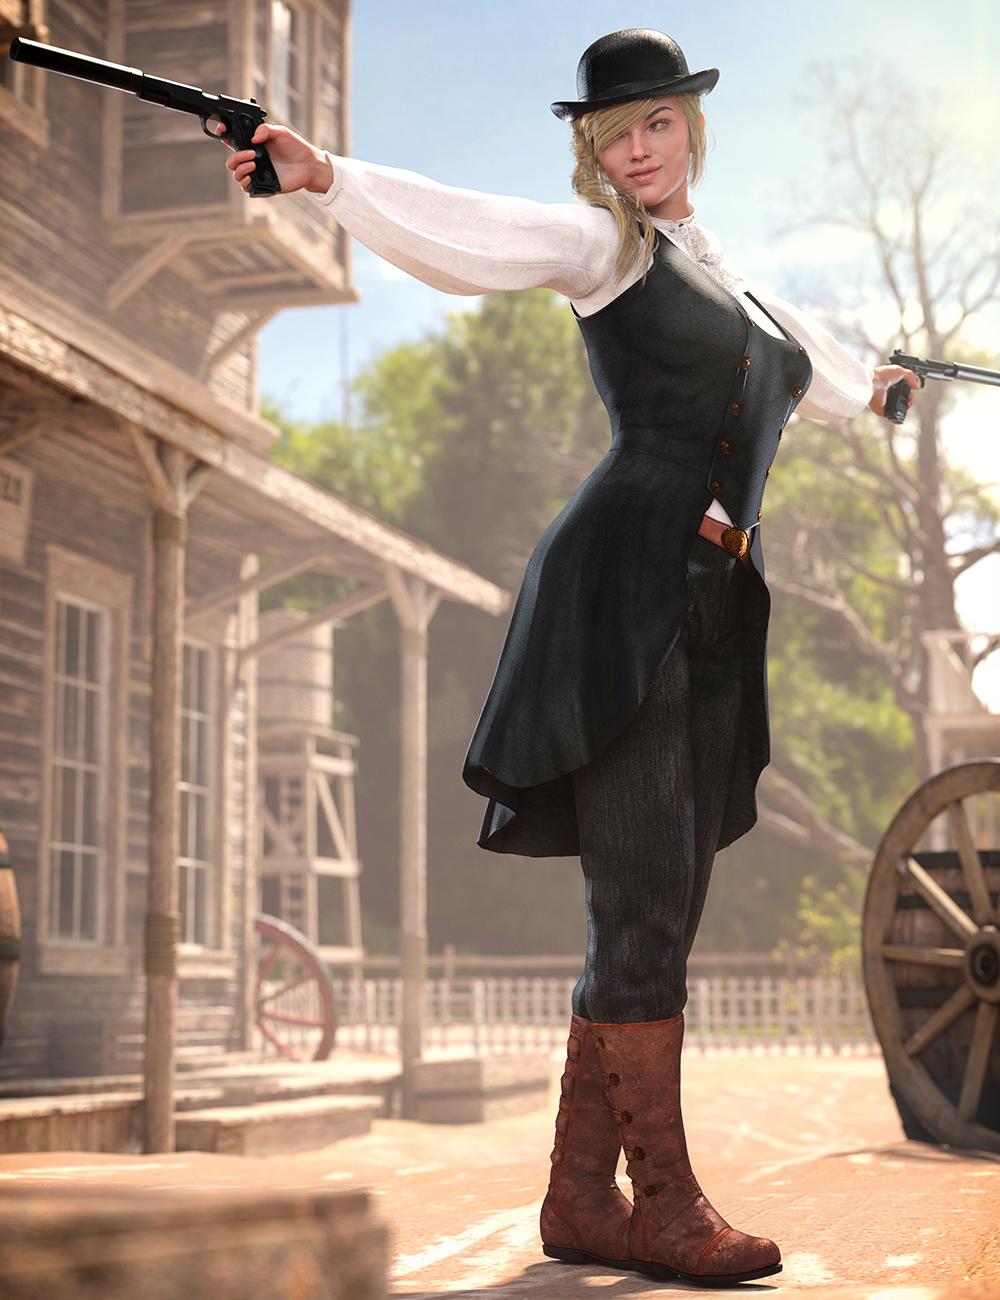 dForce Missi Judge Outfit for Genesis 8 Female(s) by: Arki, 3D Models by Daz 3D